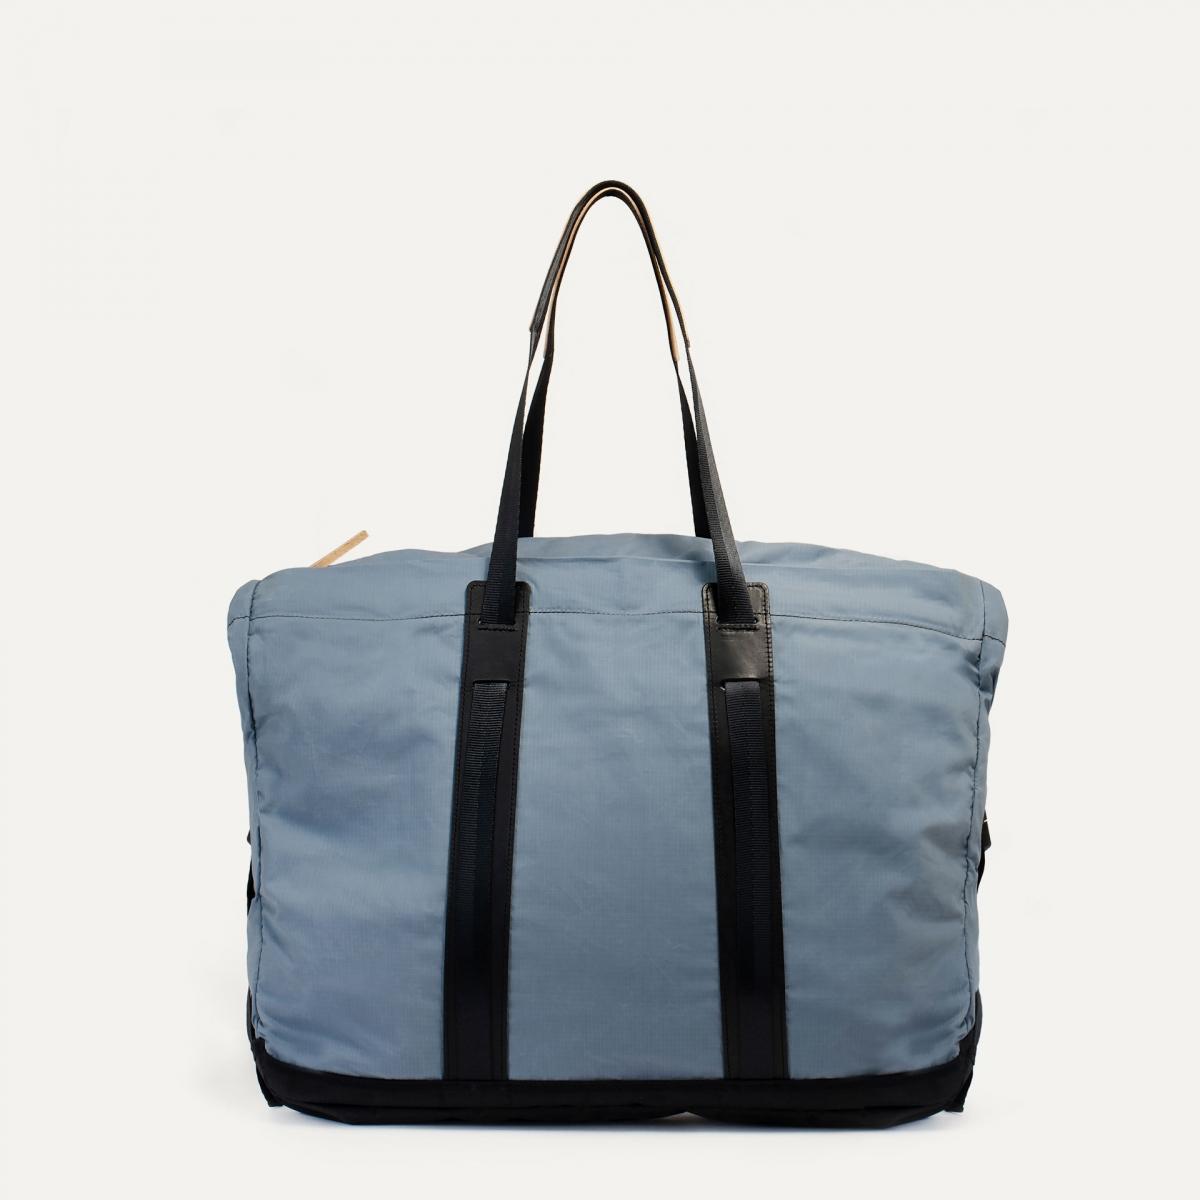 15L Barda Tote bag - blue grey (image n°3)